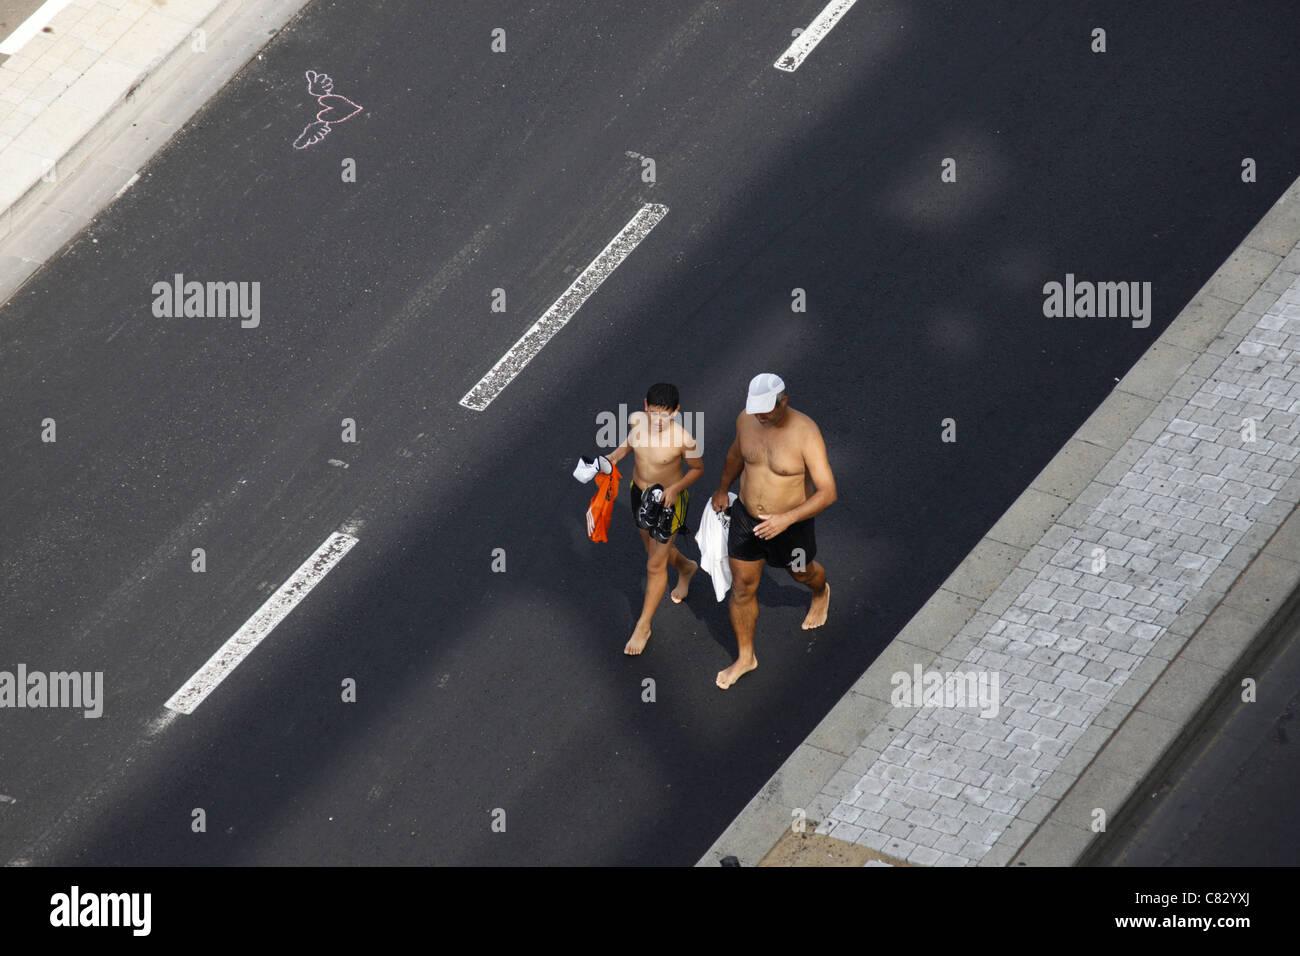 Local residents walking in empty motorway Tel Aviv Israel - Stock Image